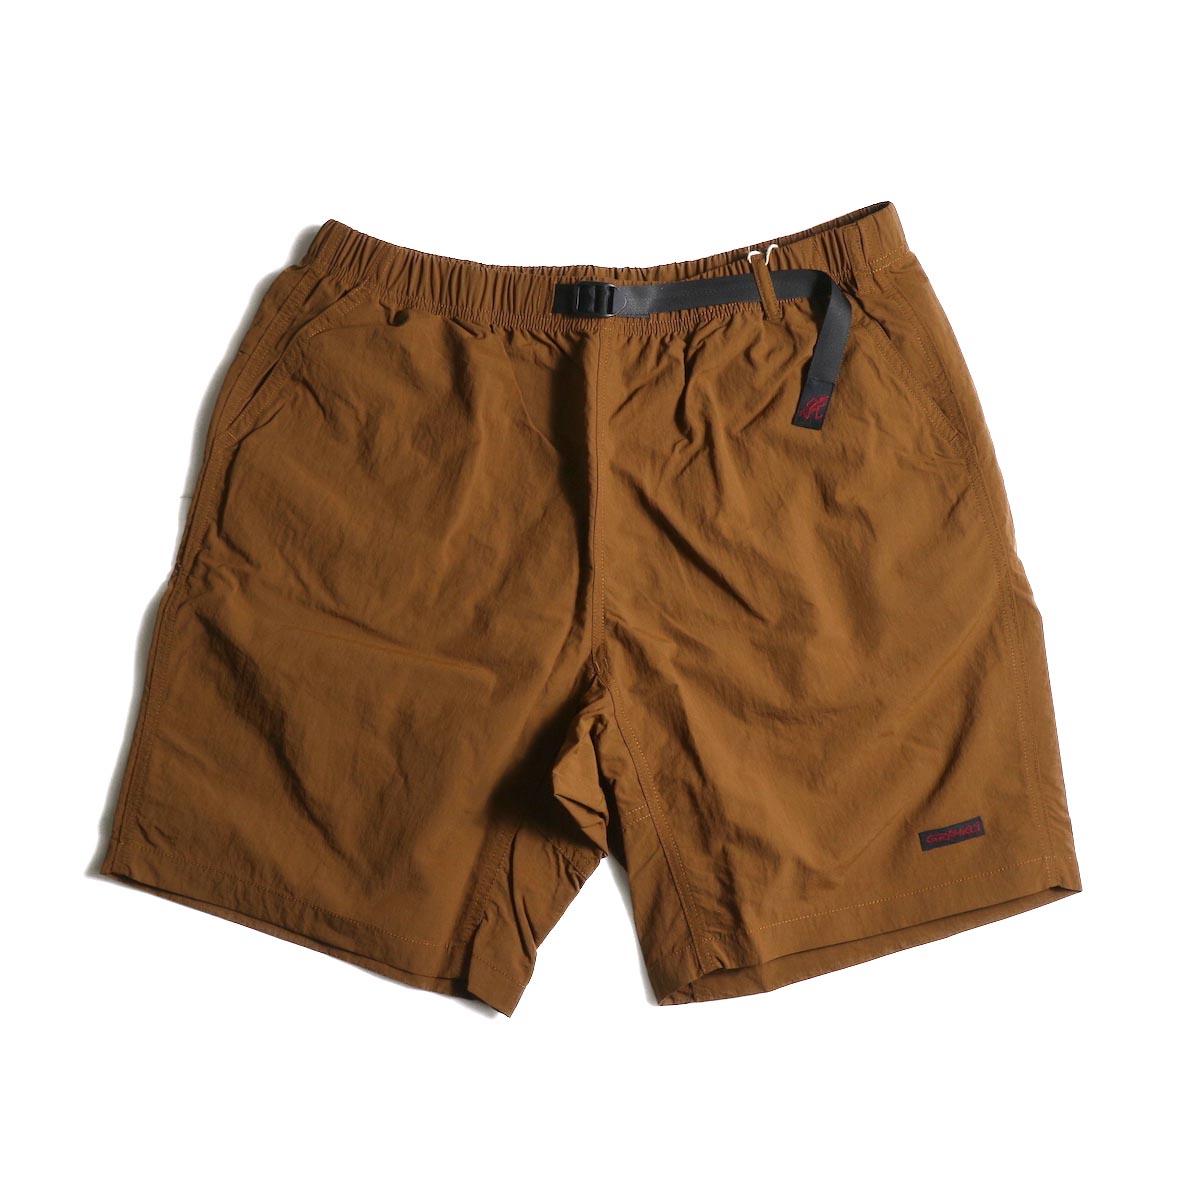 GRAMICCI / Shell Packable Shorts (Mocha)